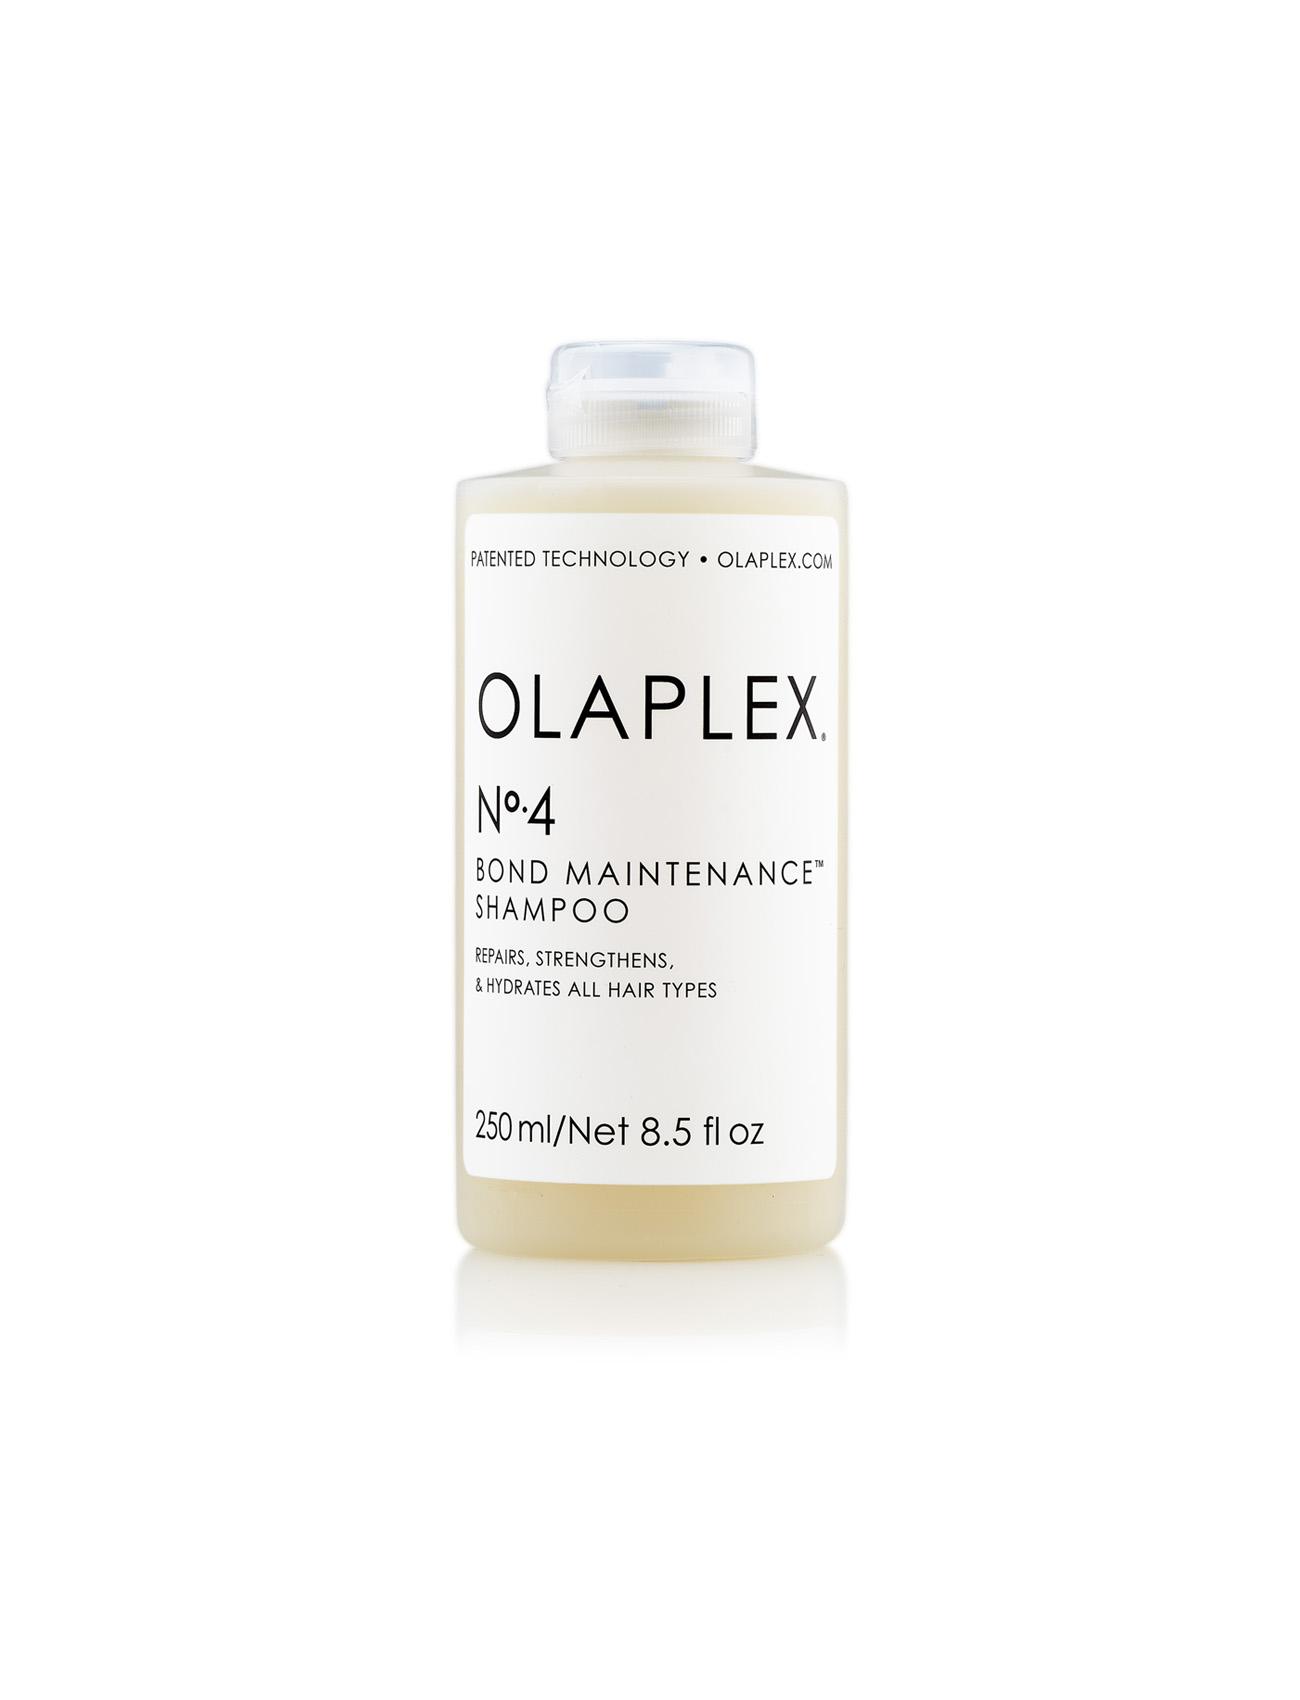 Olaplex shampoo